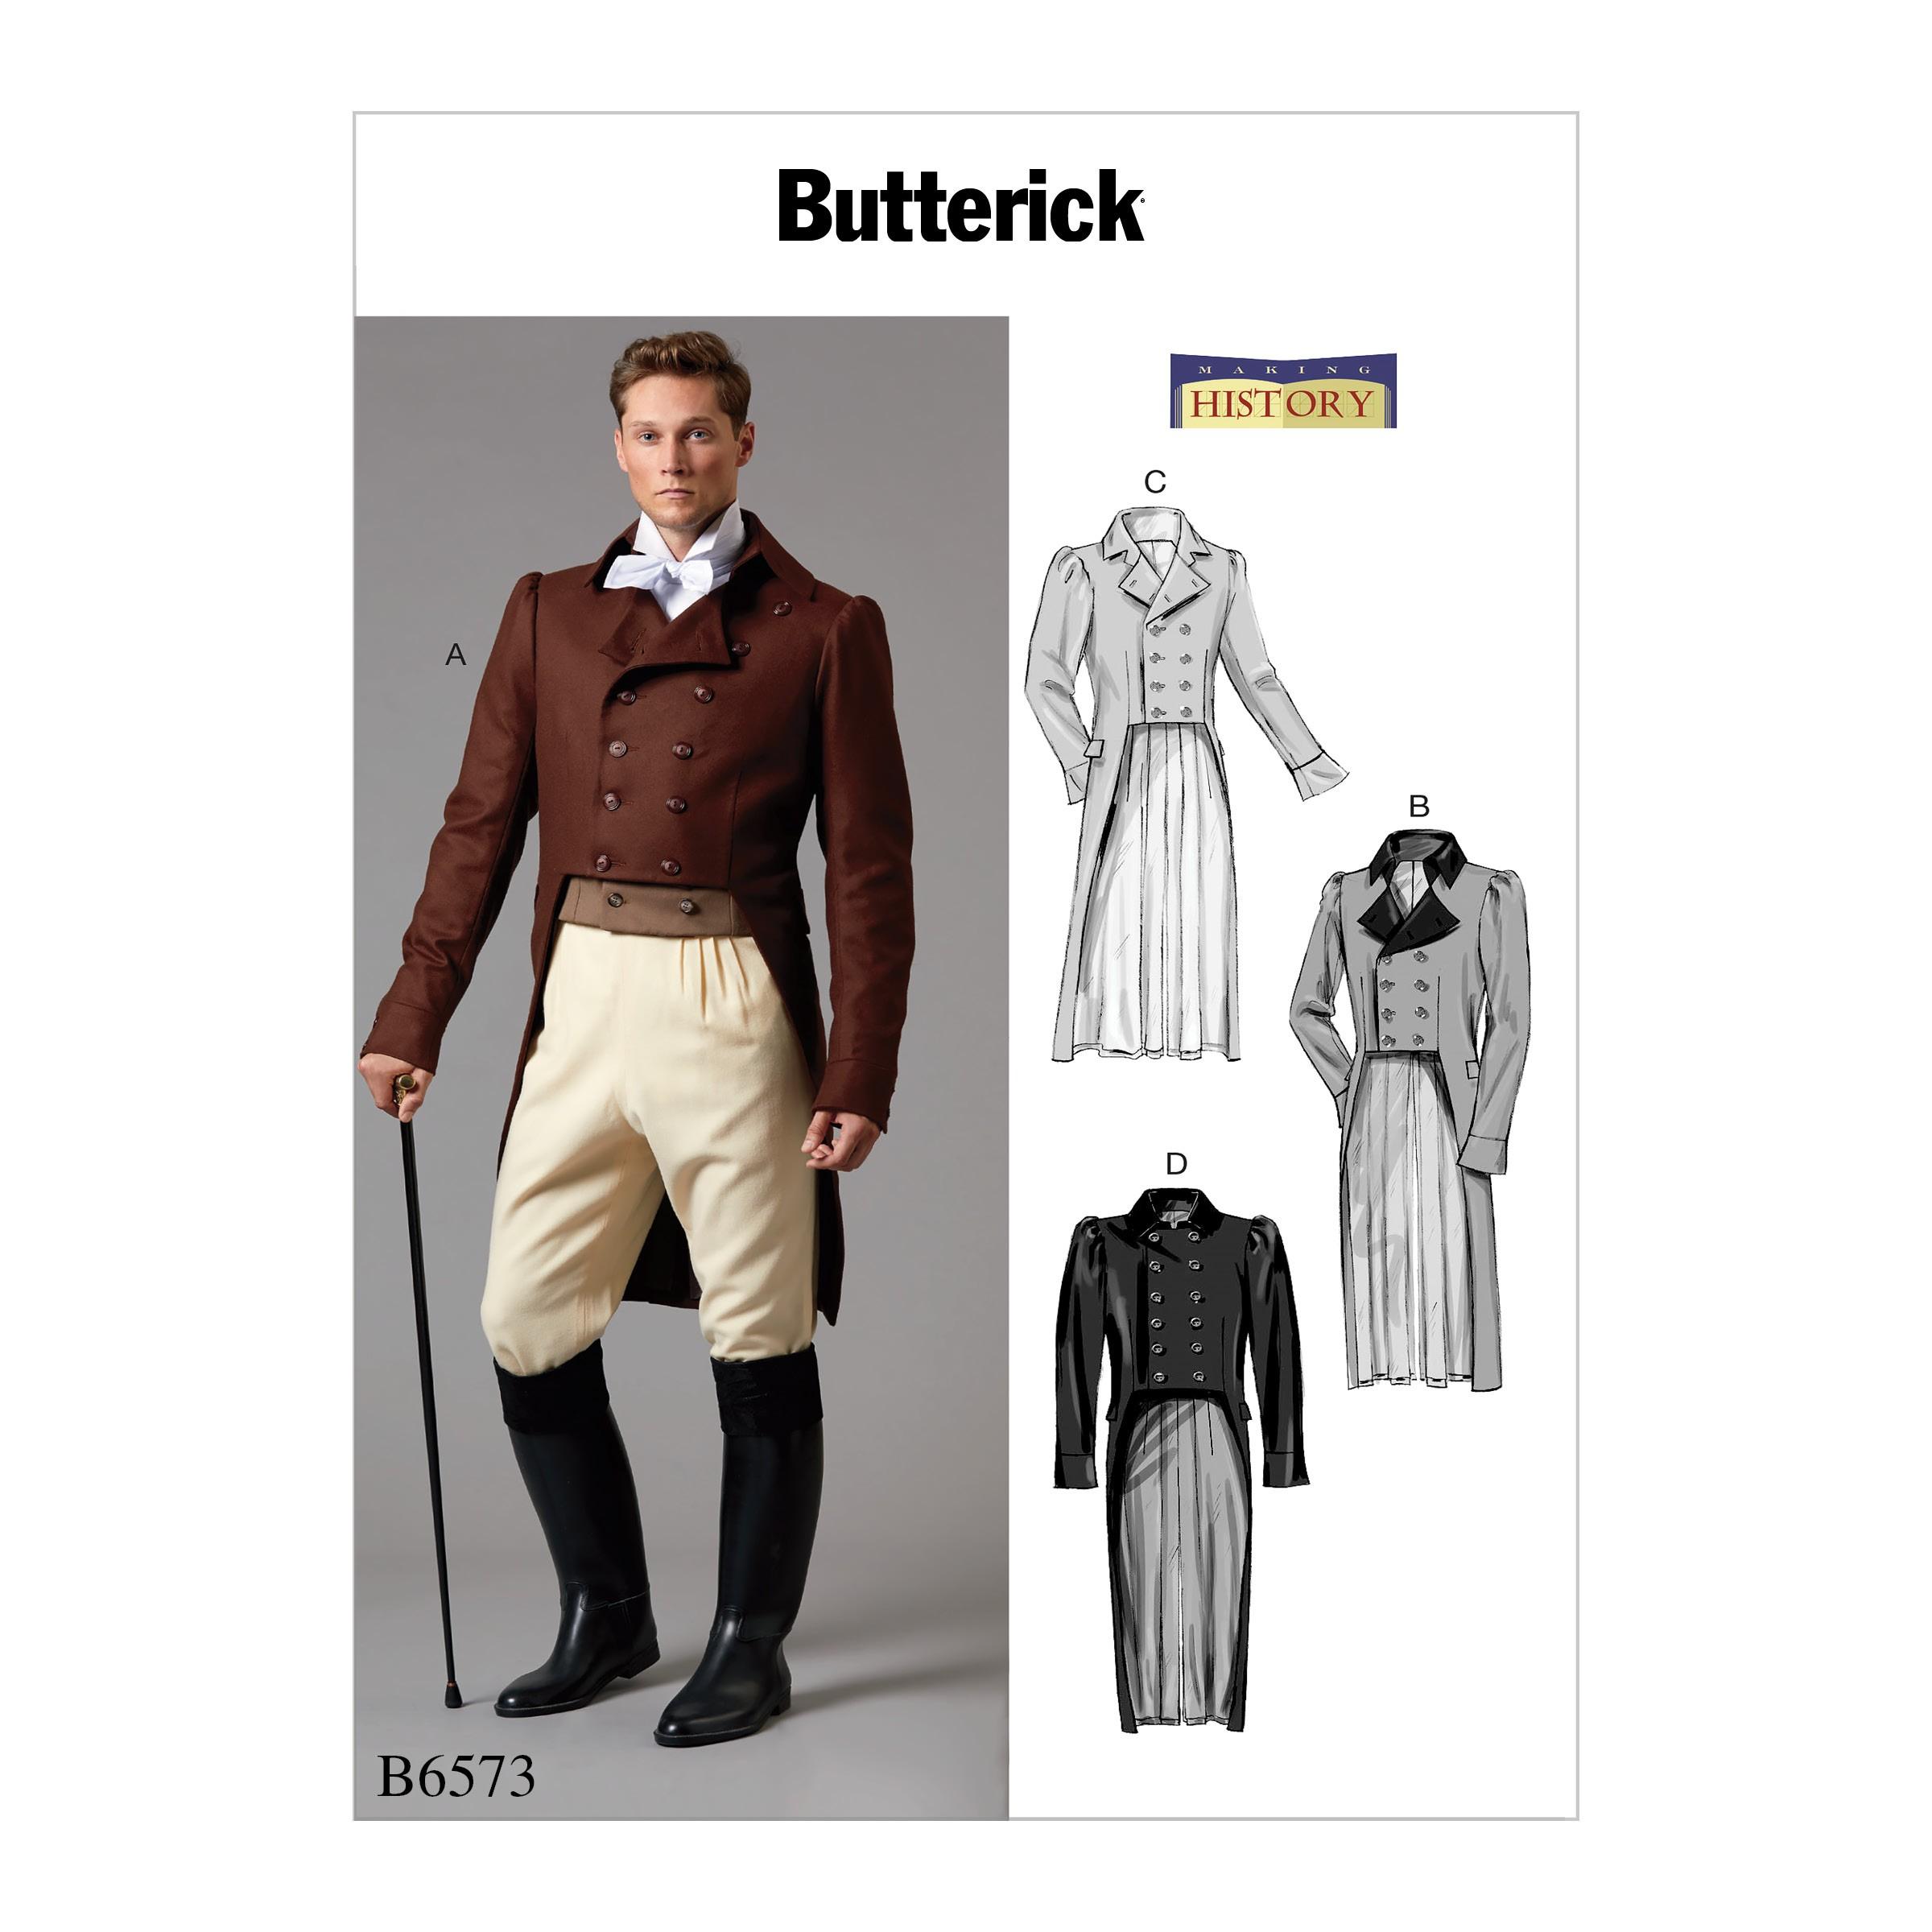 Butterick Sewing Pattern 6573 Mens'